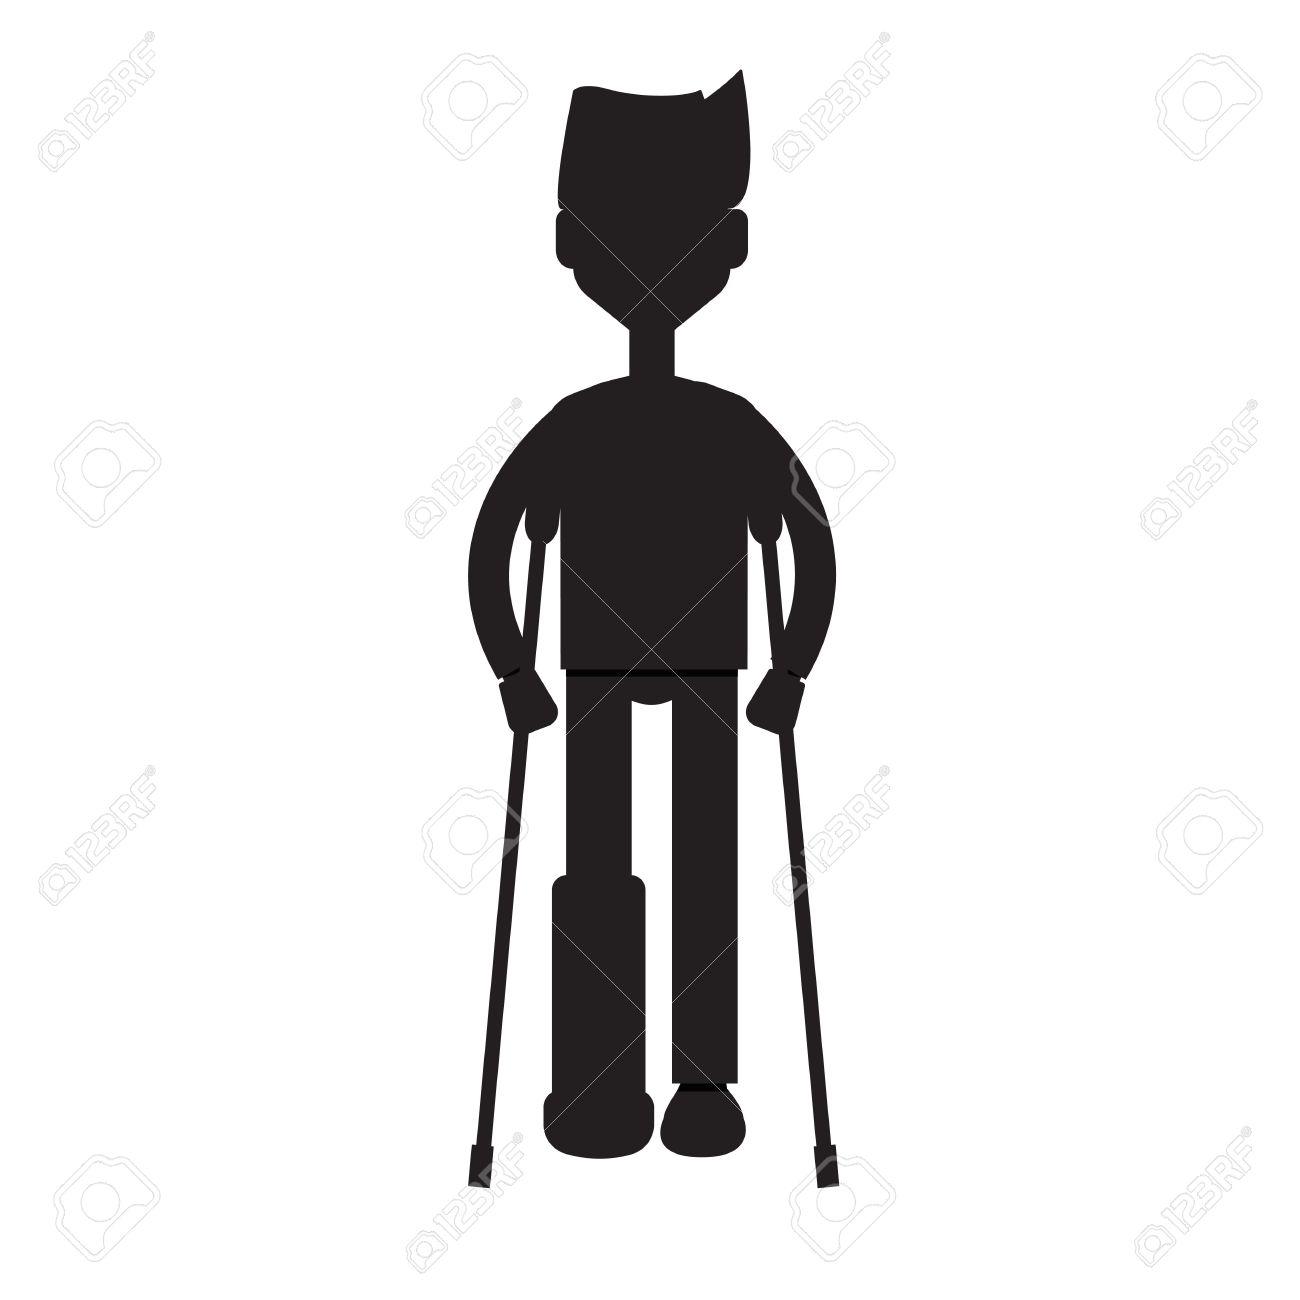 Man On Crutches silhouette.